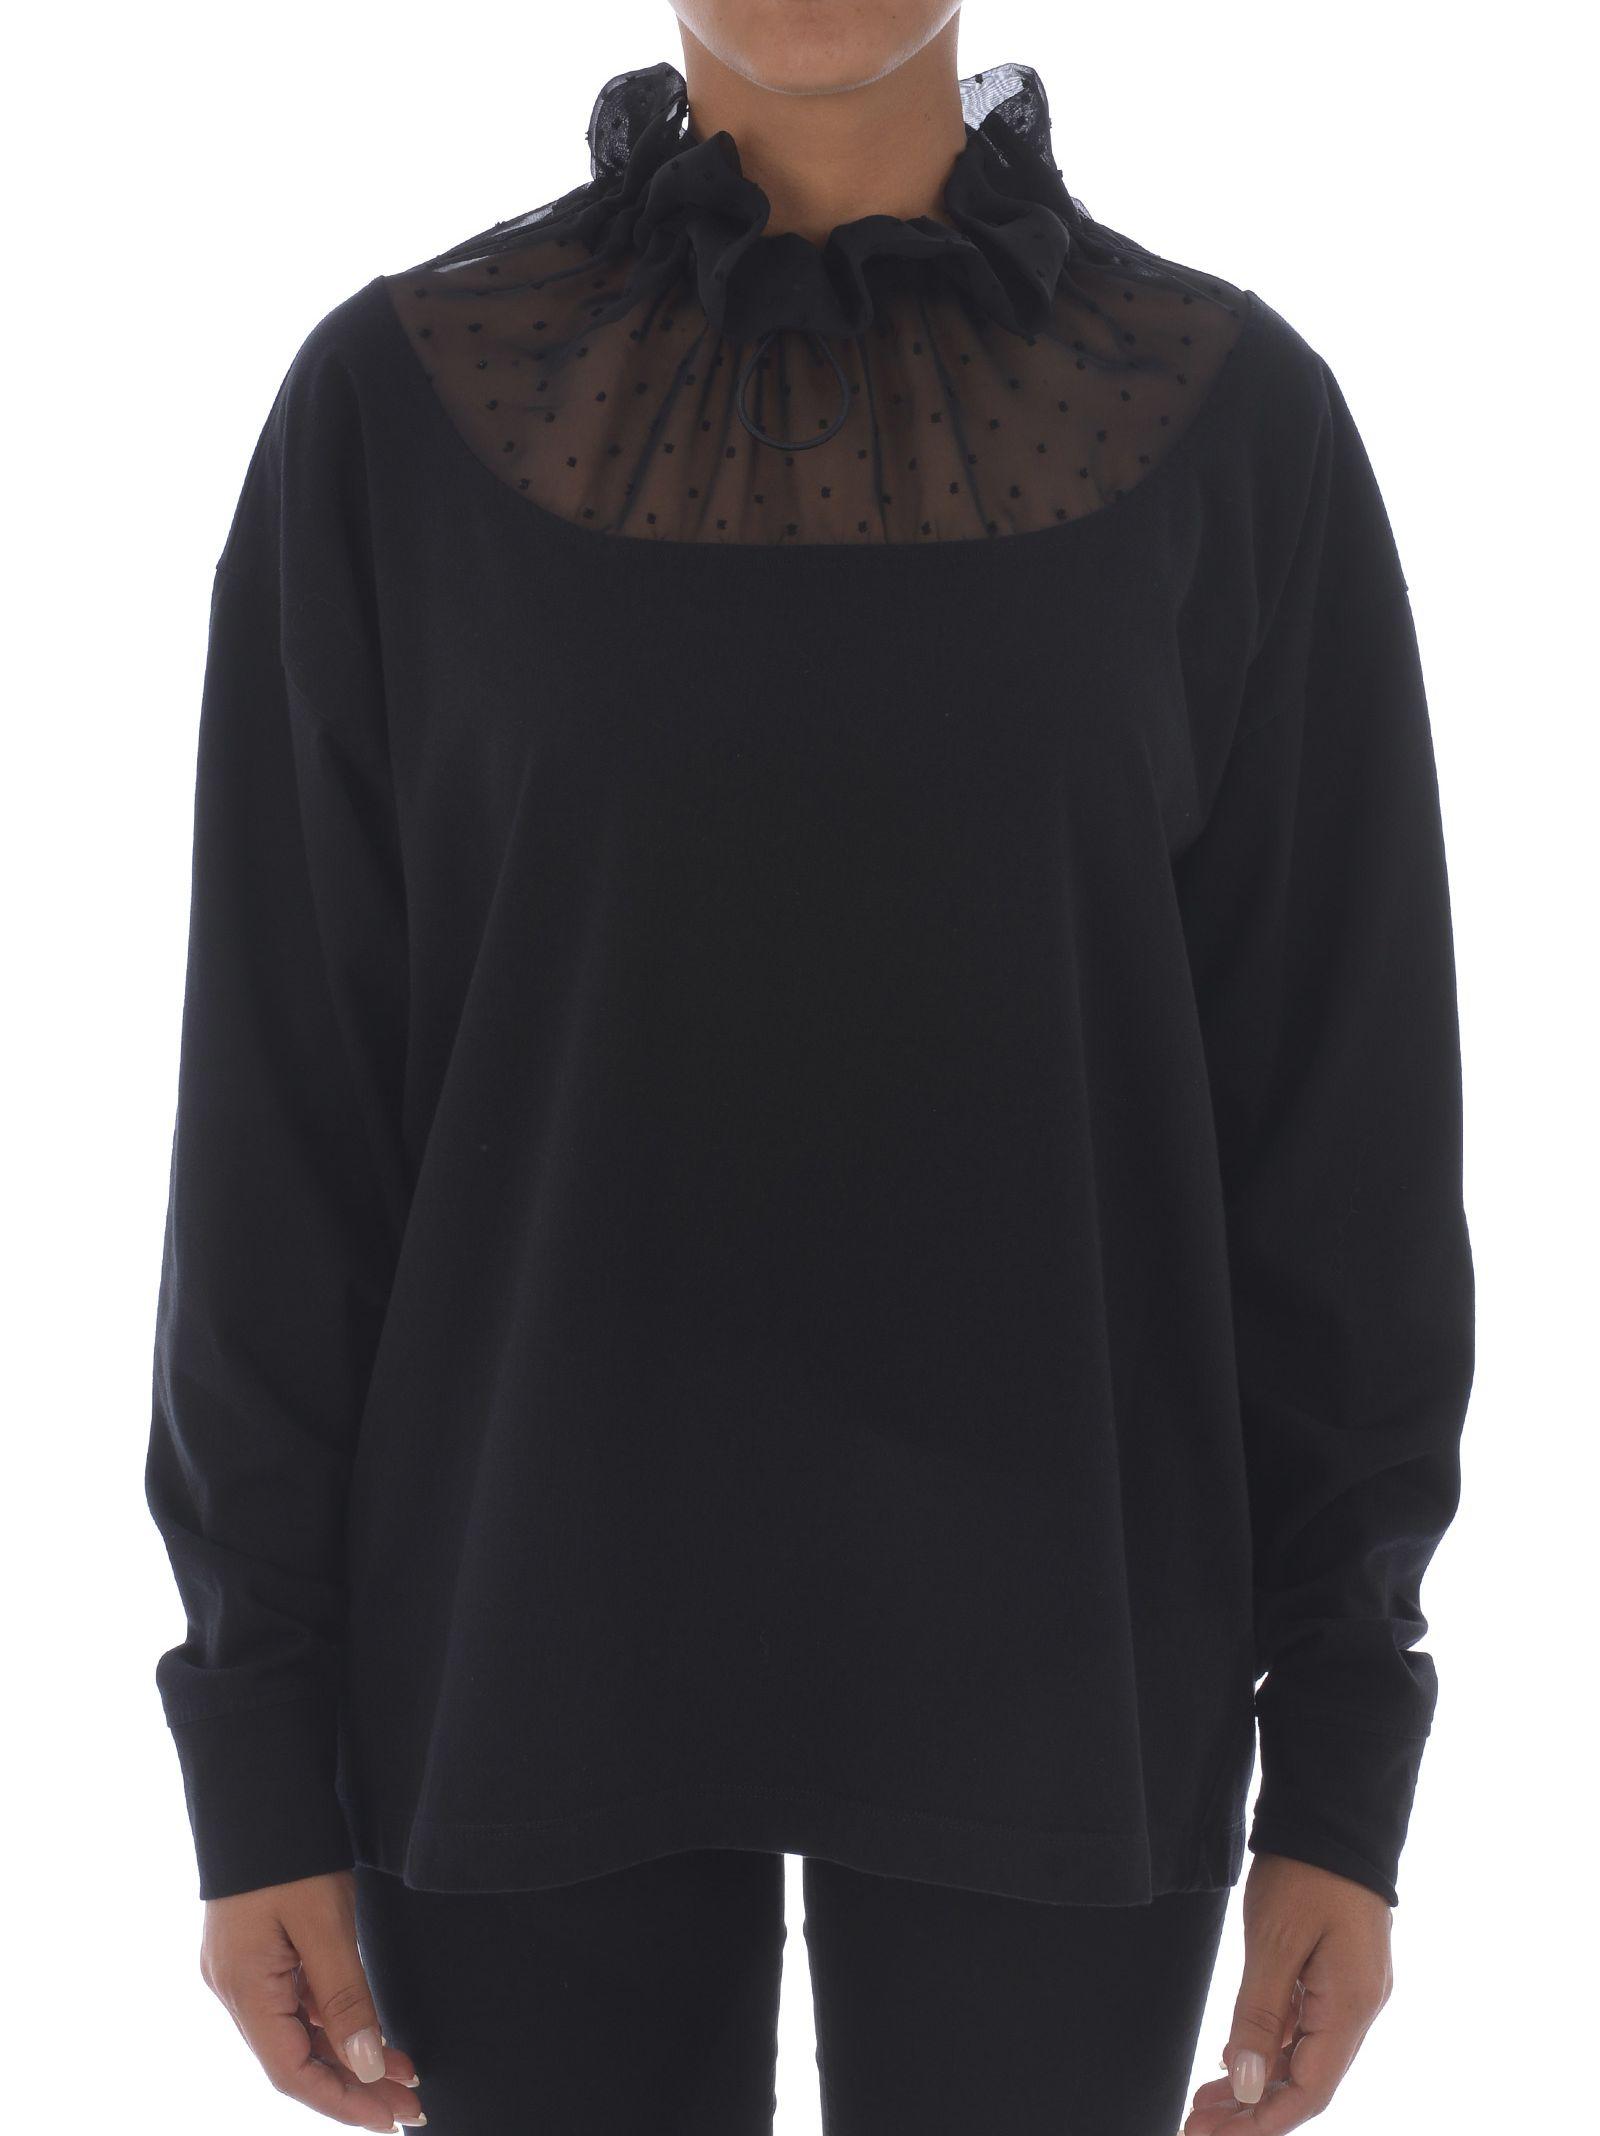 Mm6 Maison Margiela Sheer Detail Sweatshirt